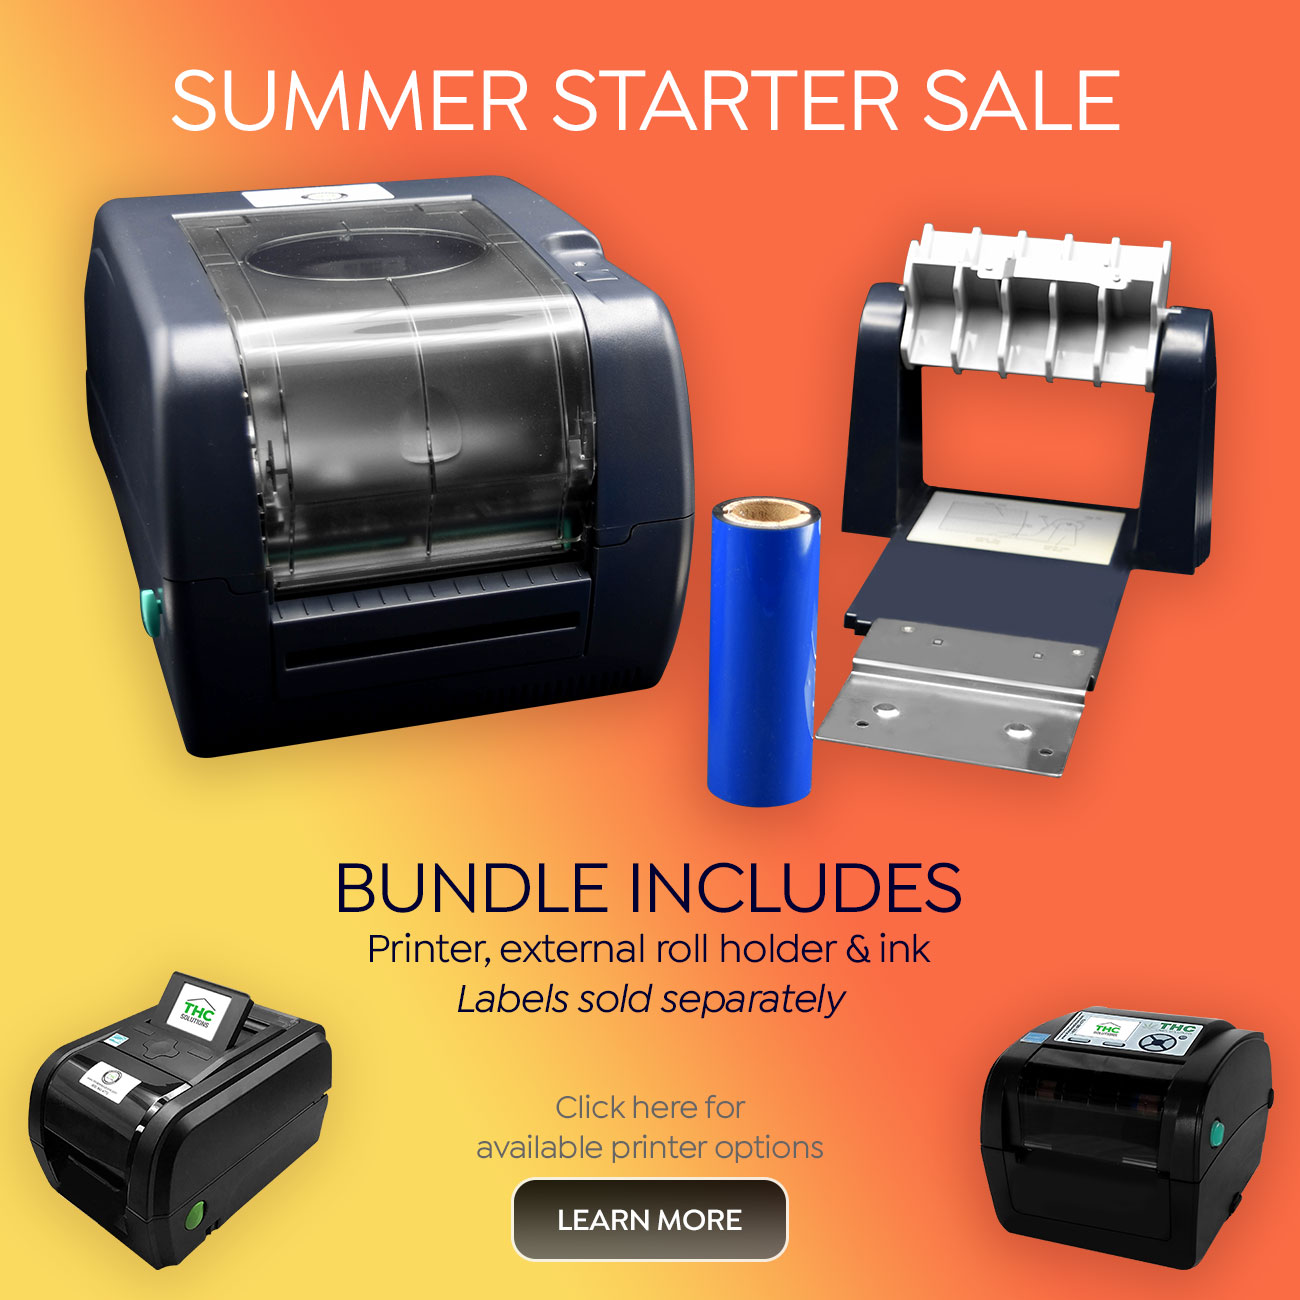 Summer Starter Sale